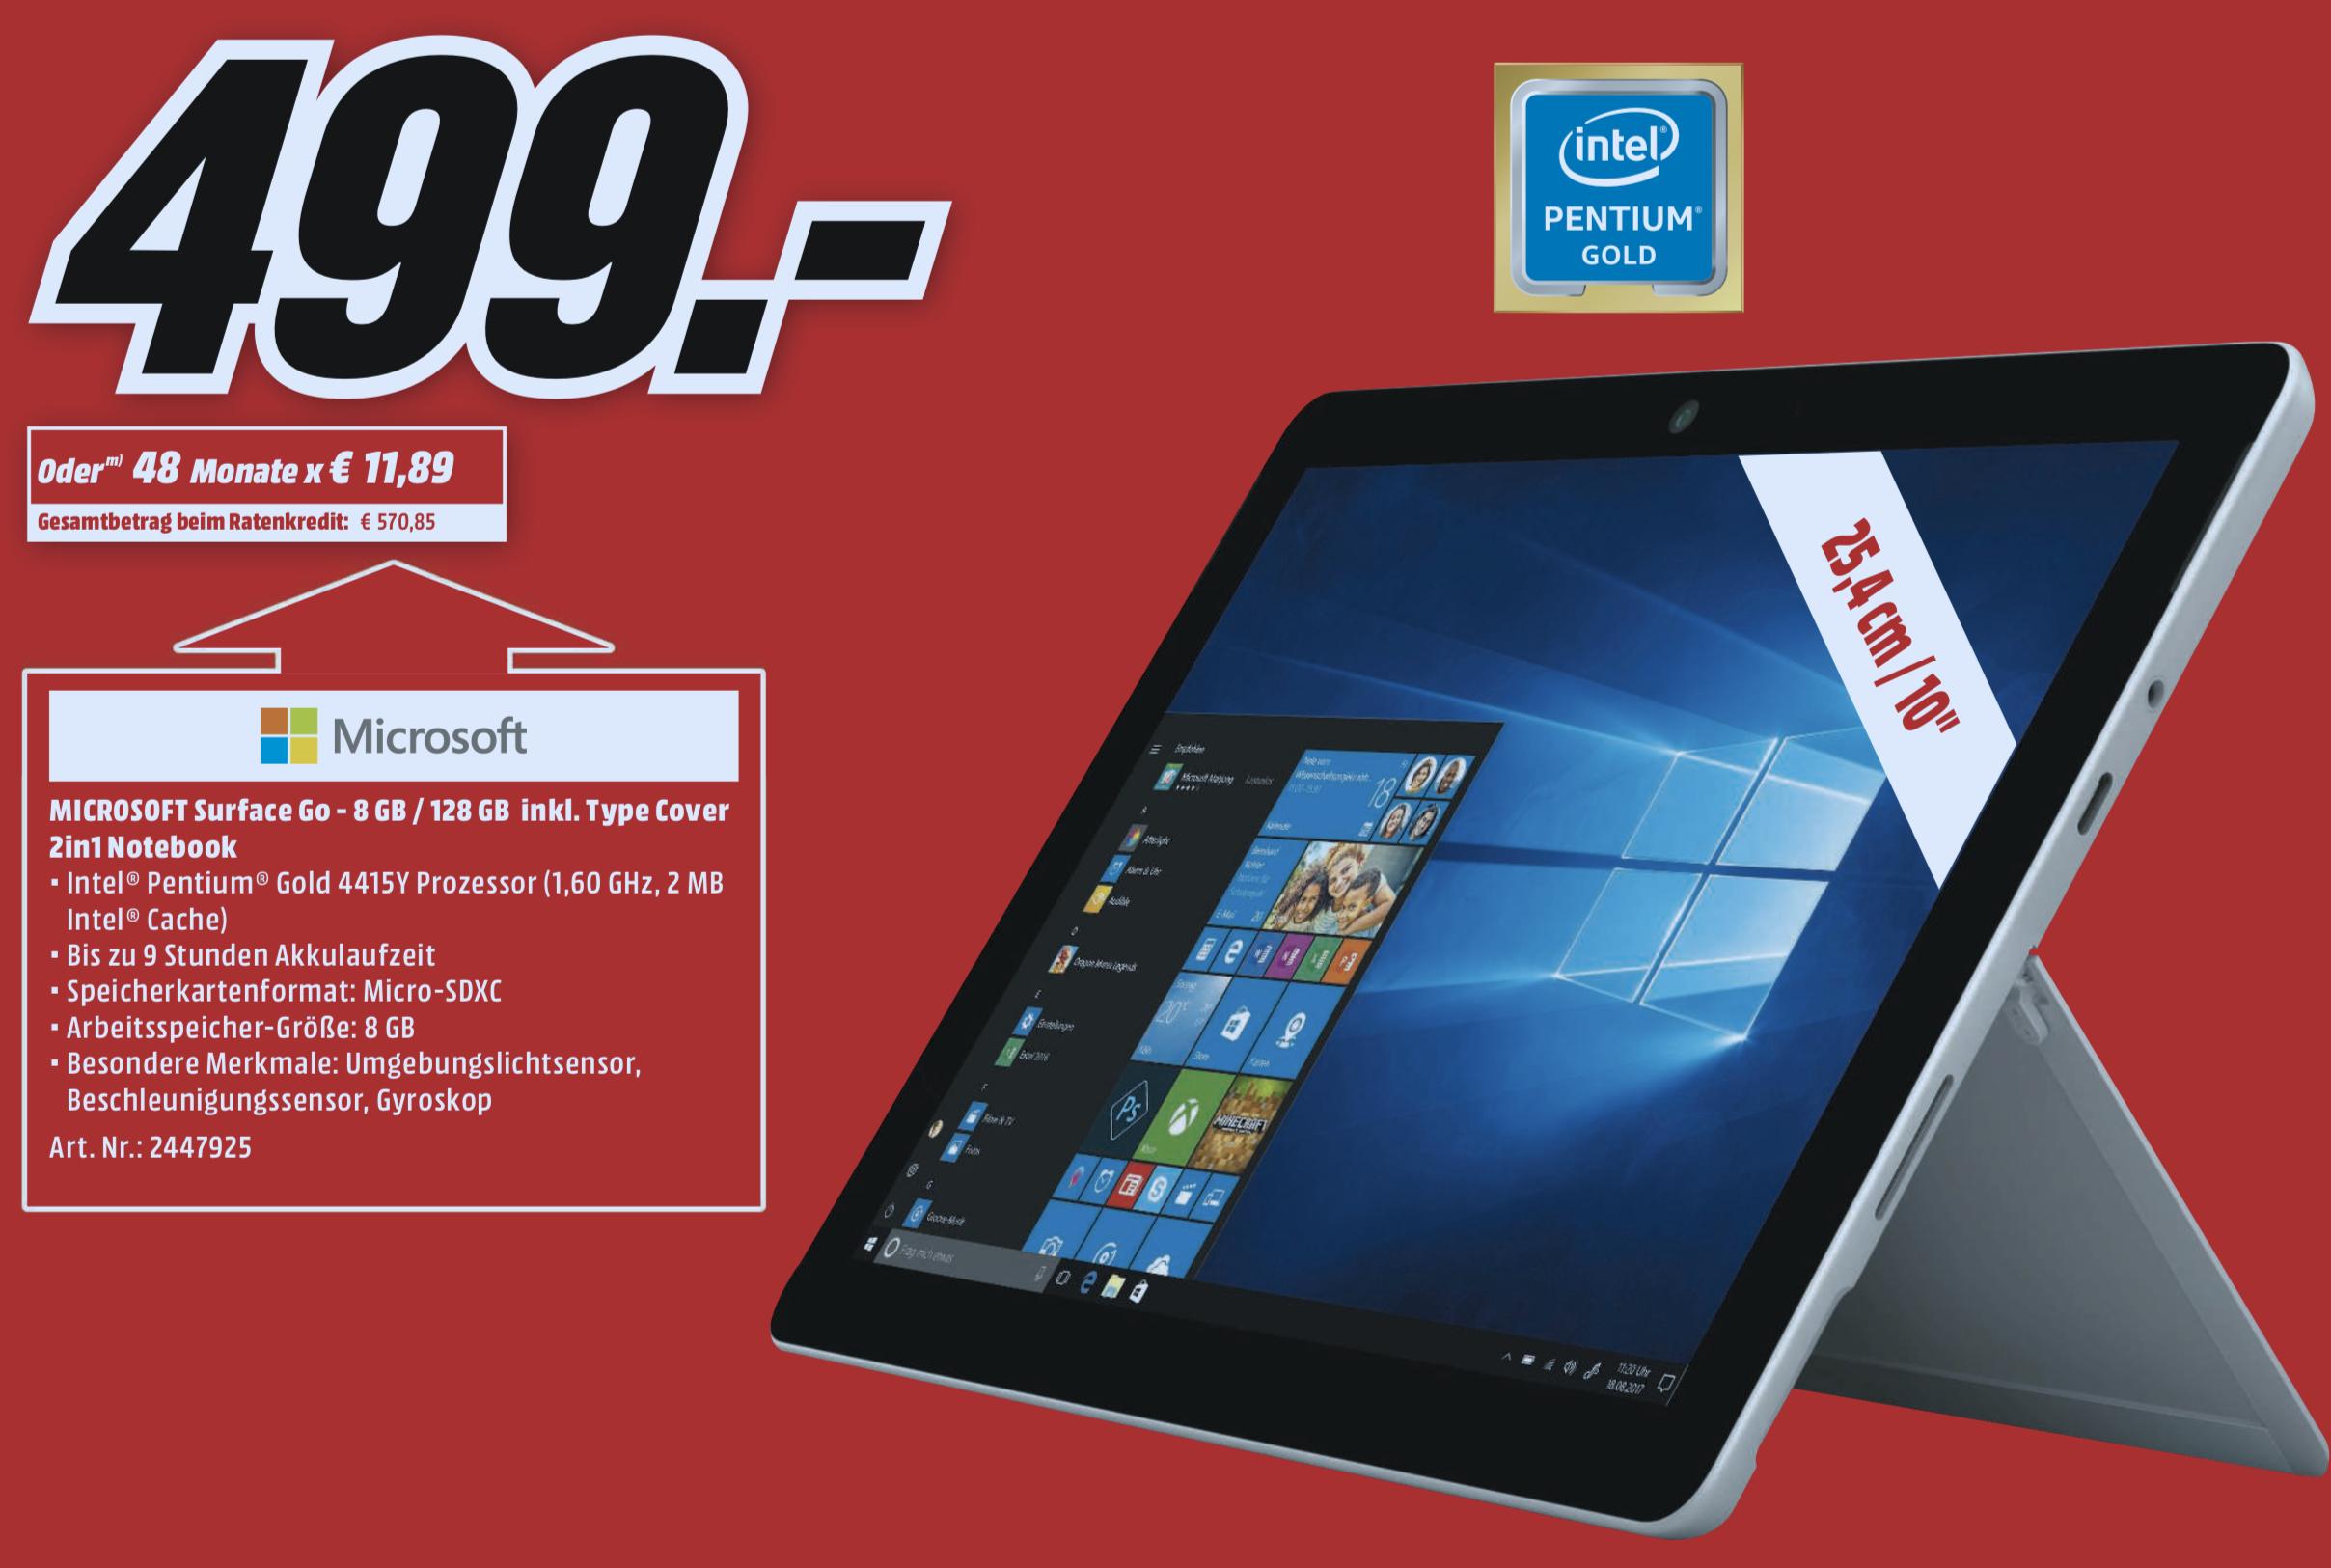 Lokal Castrop-Rauxel: MICROSOFT Surface Go 128GB SSD 8GB RAM + Type Cover für 499€ oder Anker Soundcore Flare 2 Stück für 79€